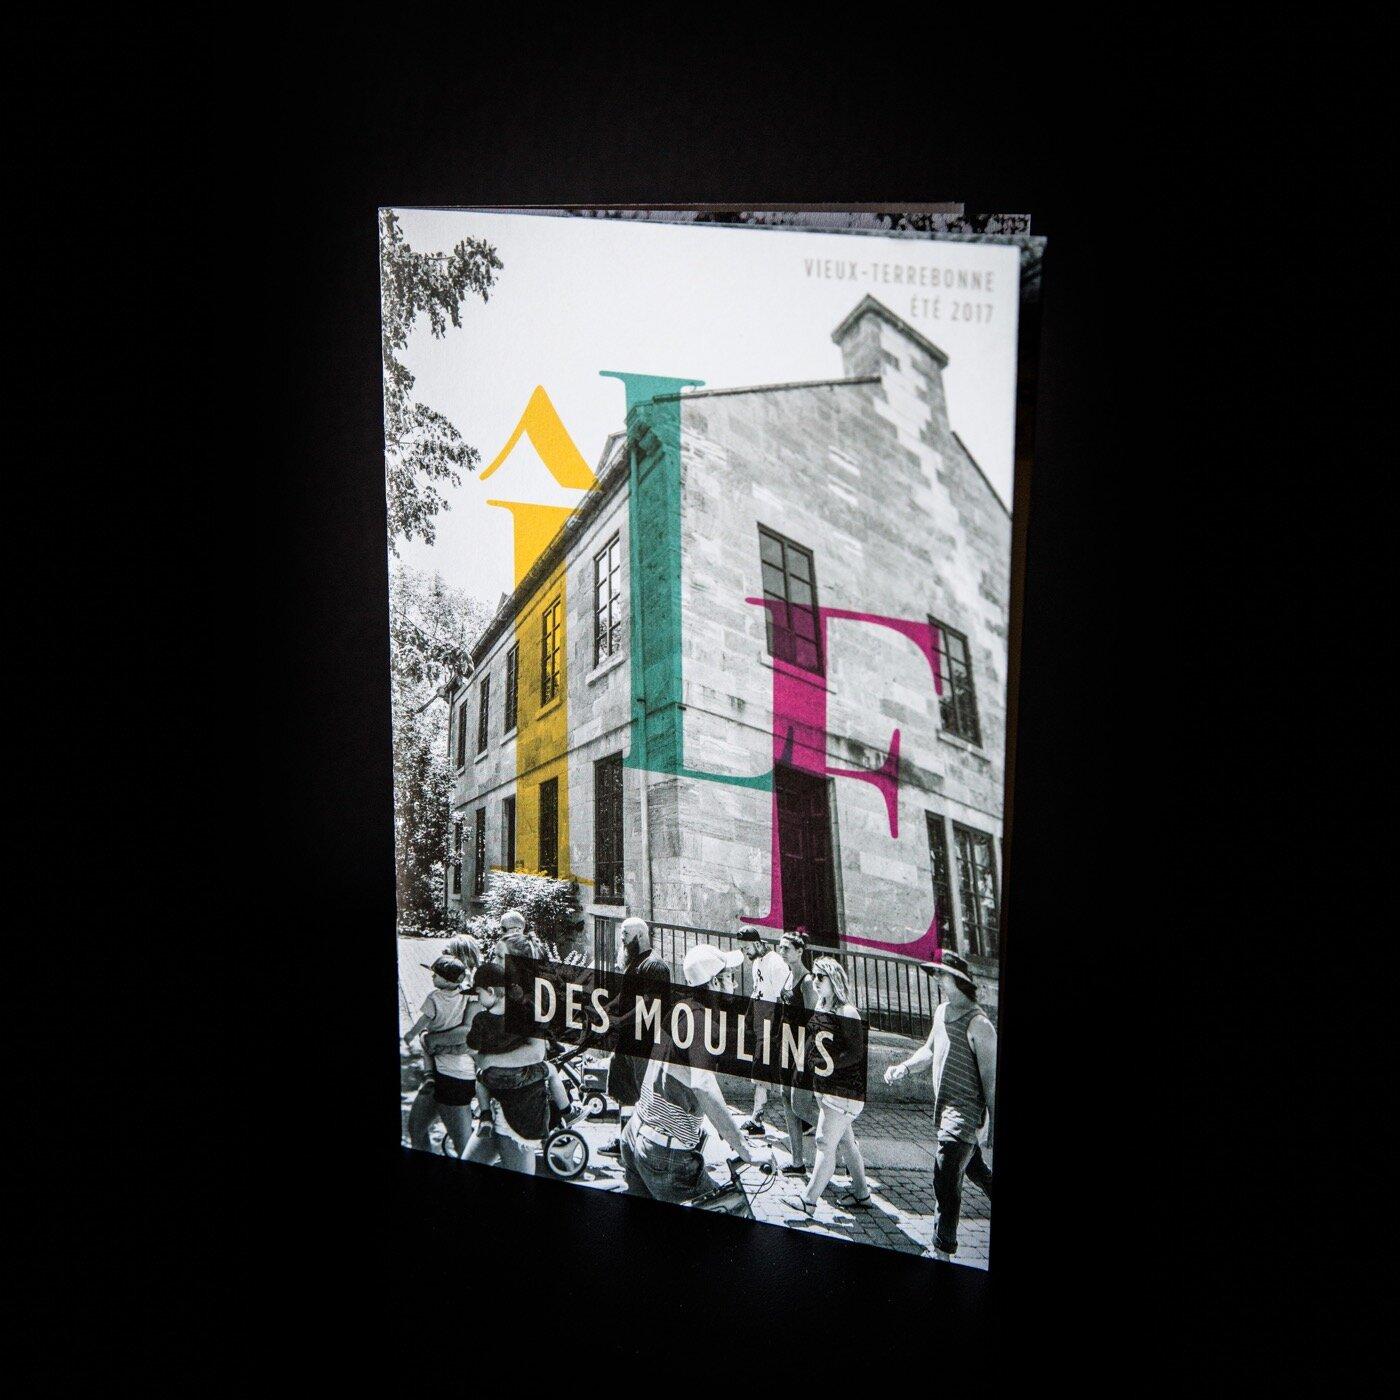 ile-des-moulins-public-olivier-lamarre-design-graphiste-14.jpg